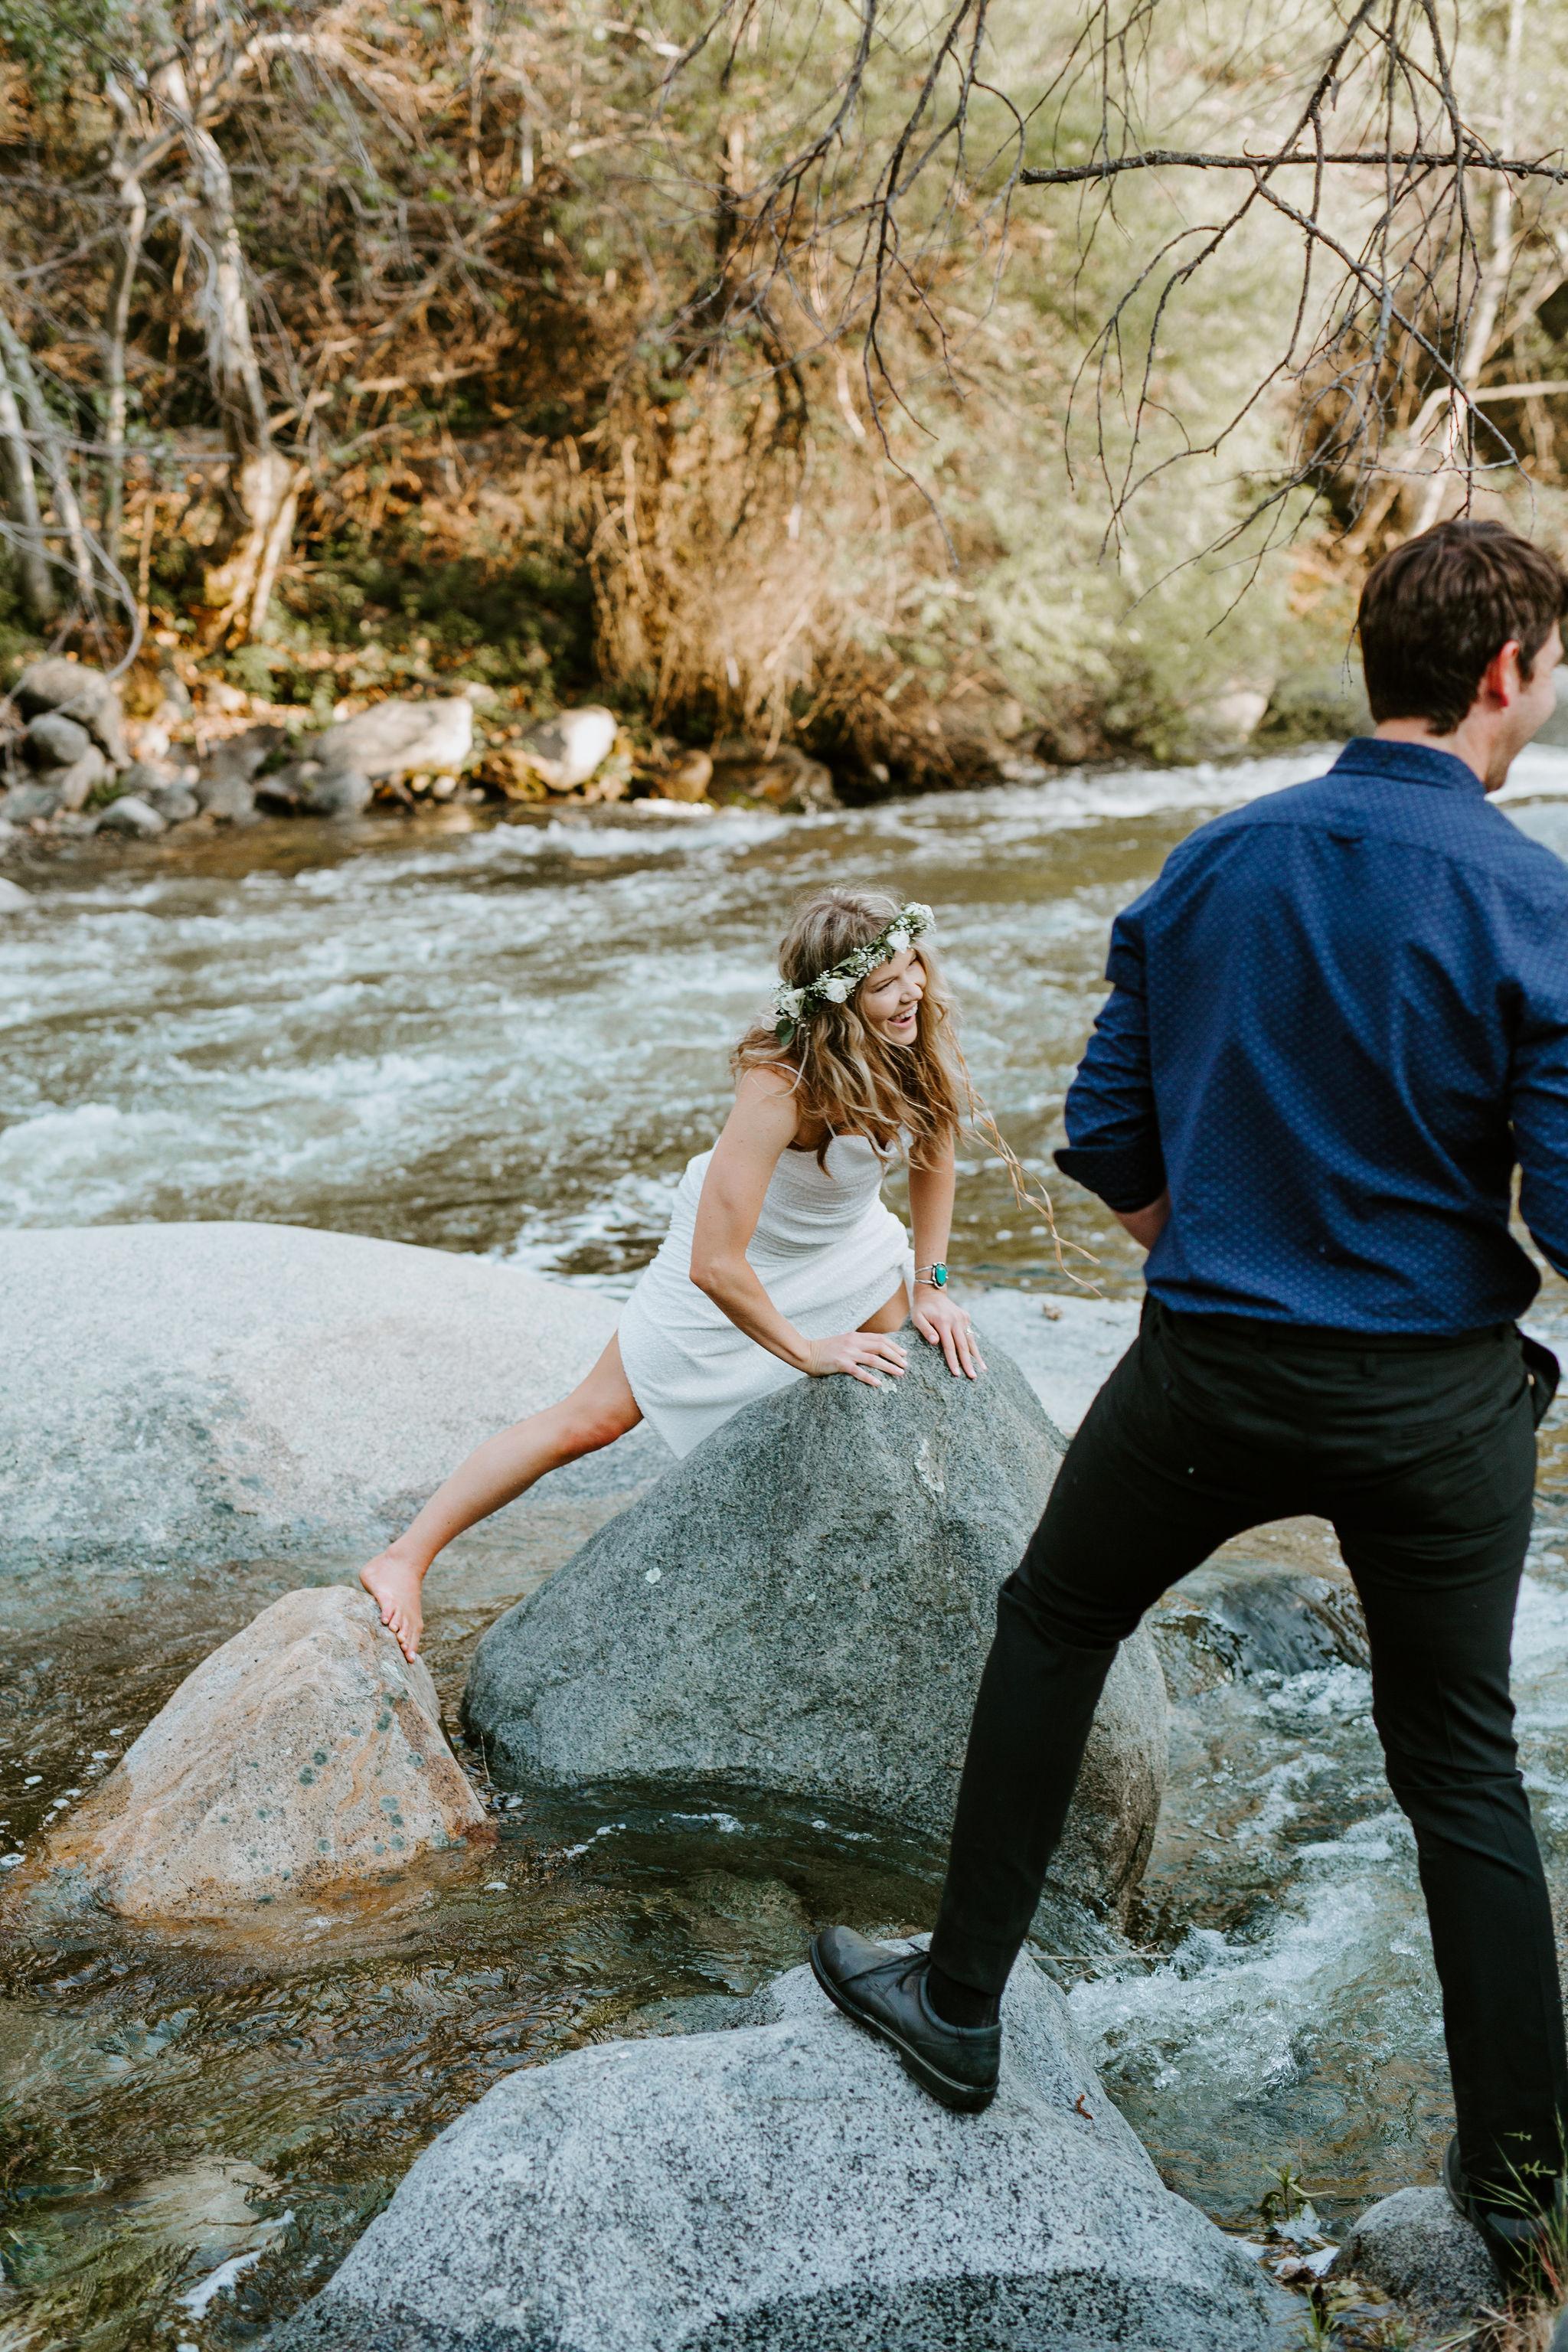 RedwoodRanch_Geoff&LyndsiPhotography_Mike&Amanda_Romantics82.jpg